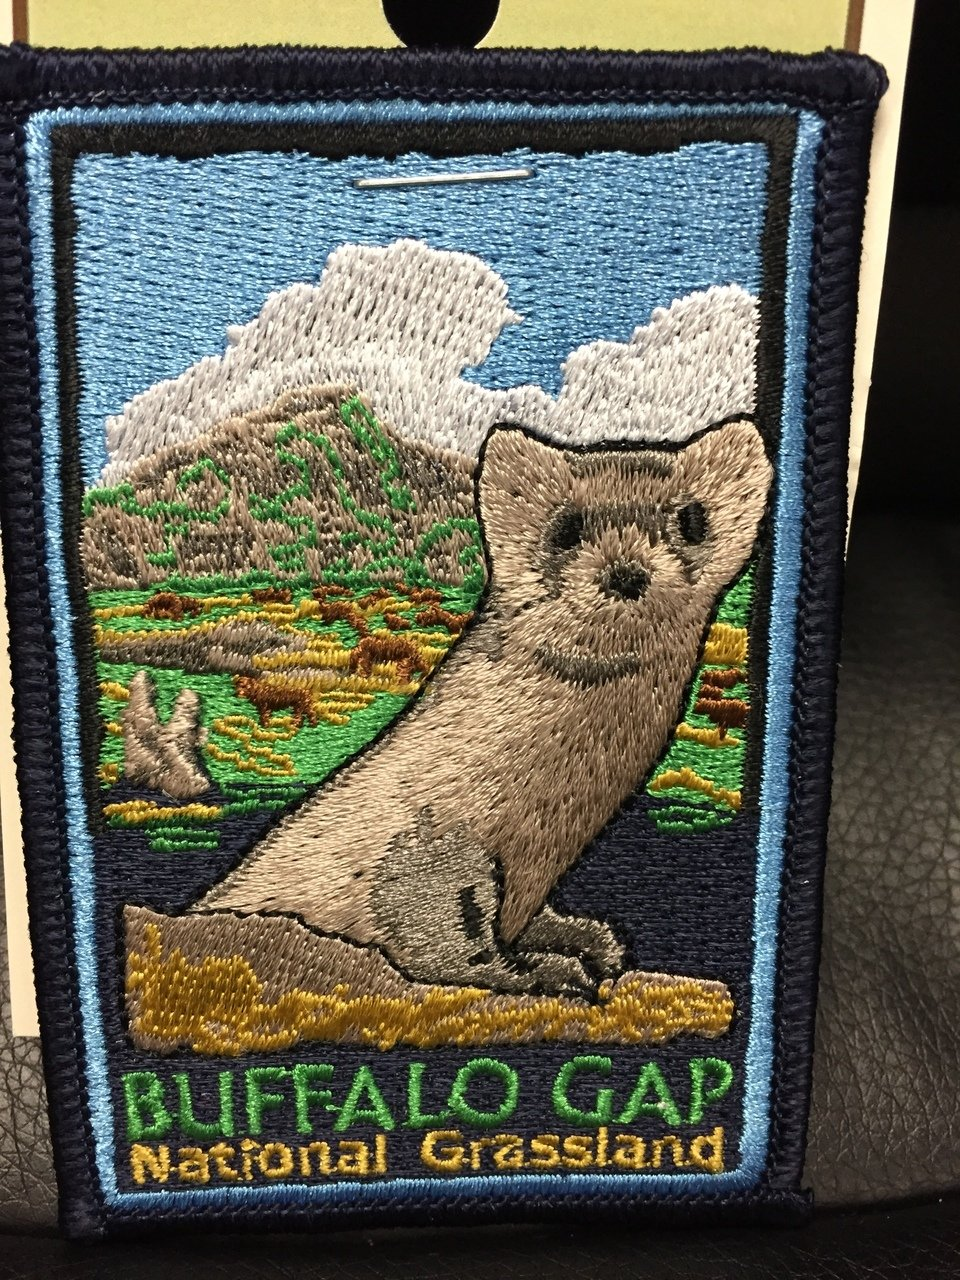 Buffalo Gap National Grassland patch